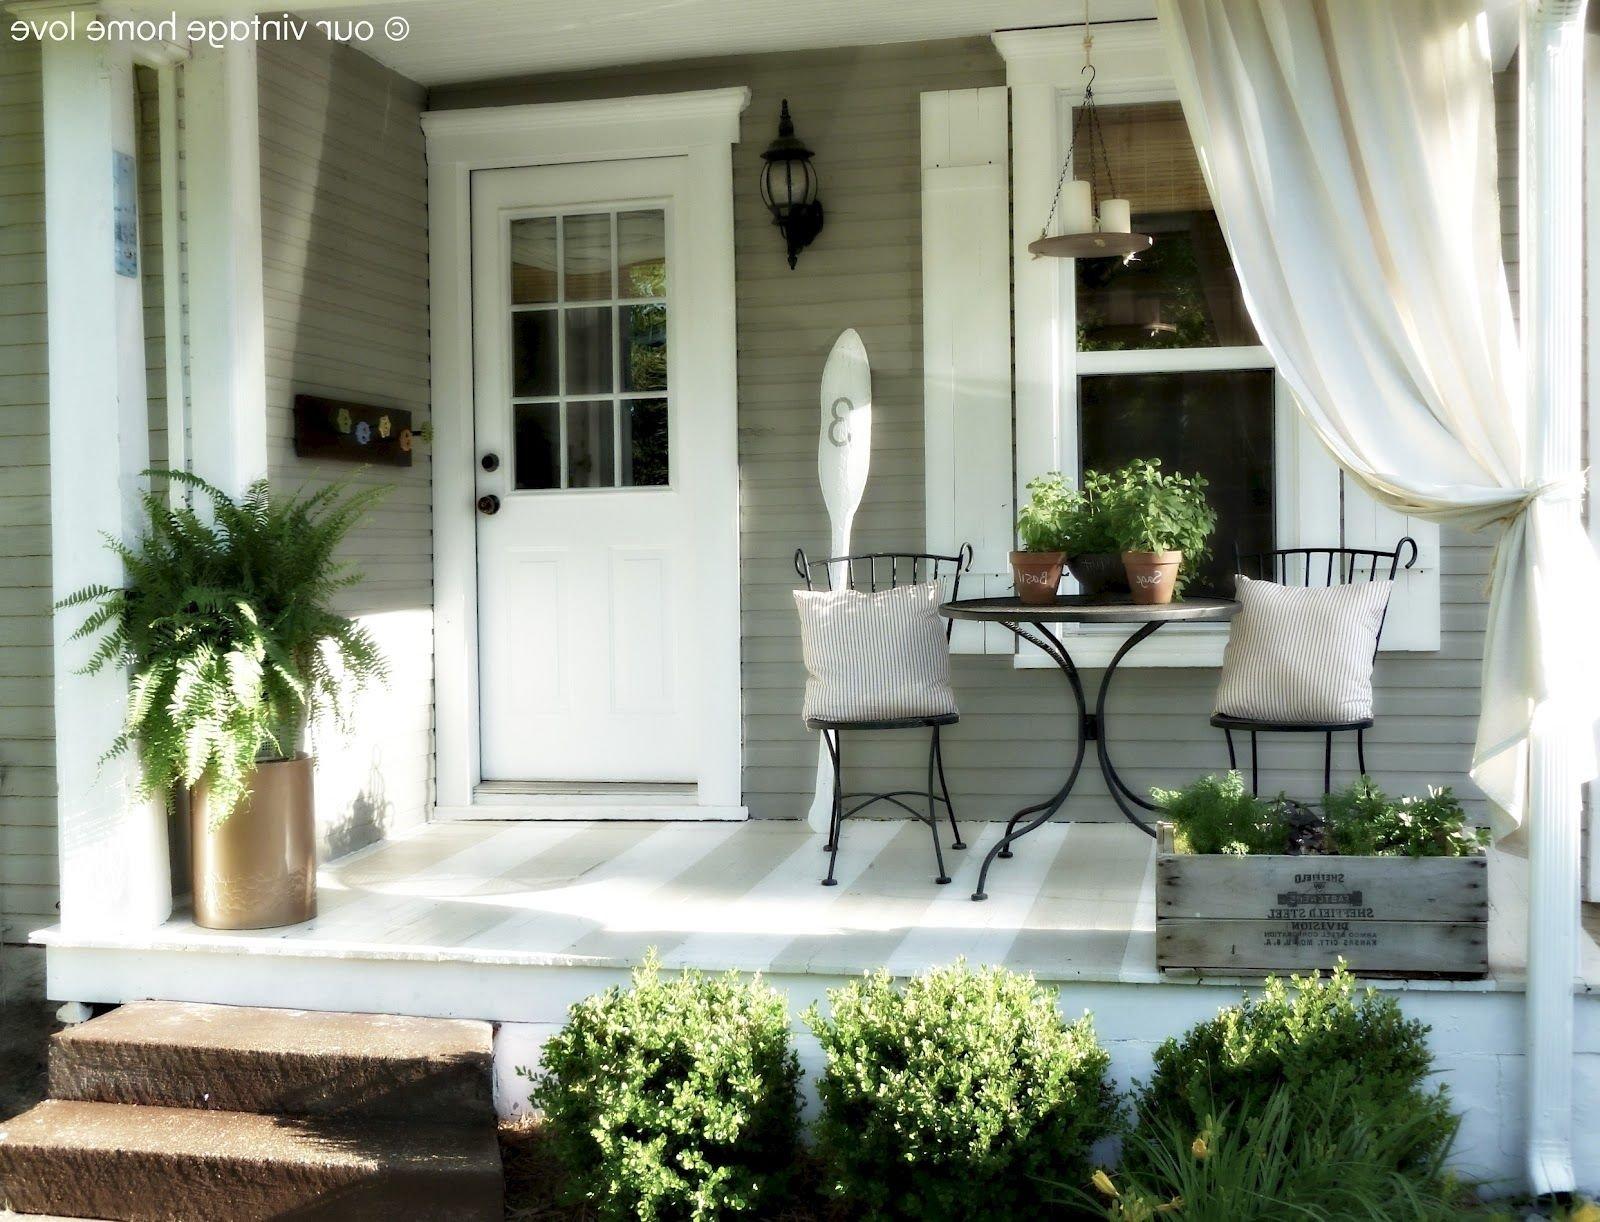 10 Elegant Small Front Porch Decorating Ideas beautiful small front porch decorating ideas gallery decorating 2021